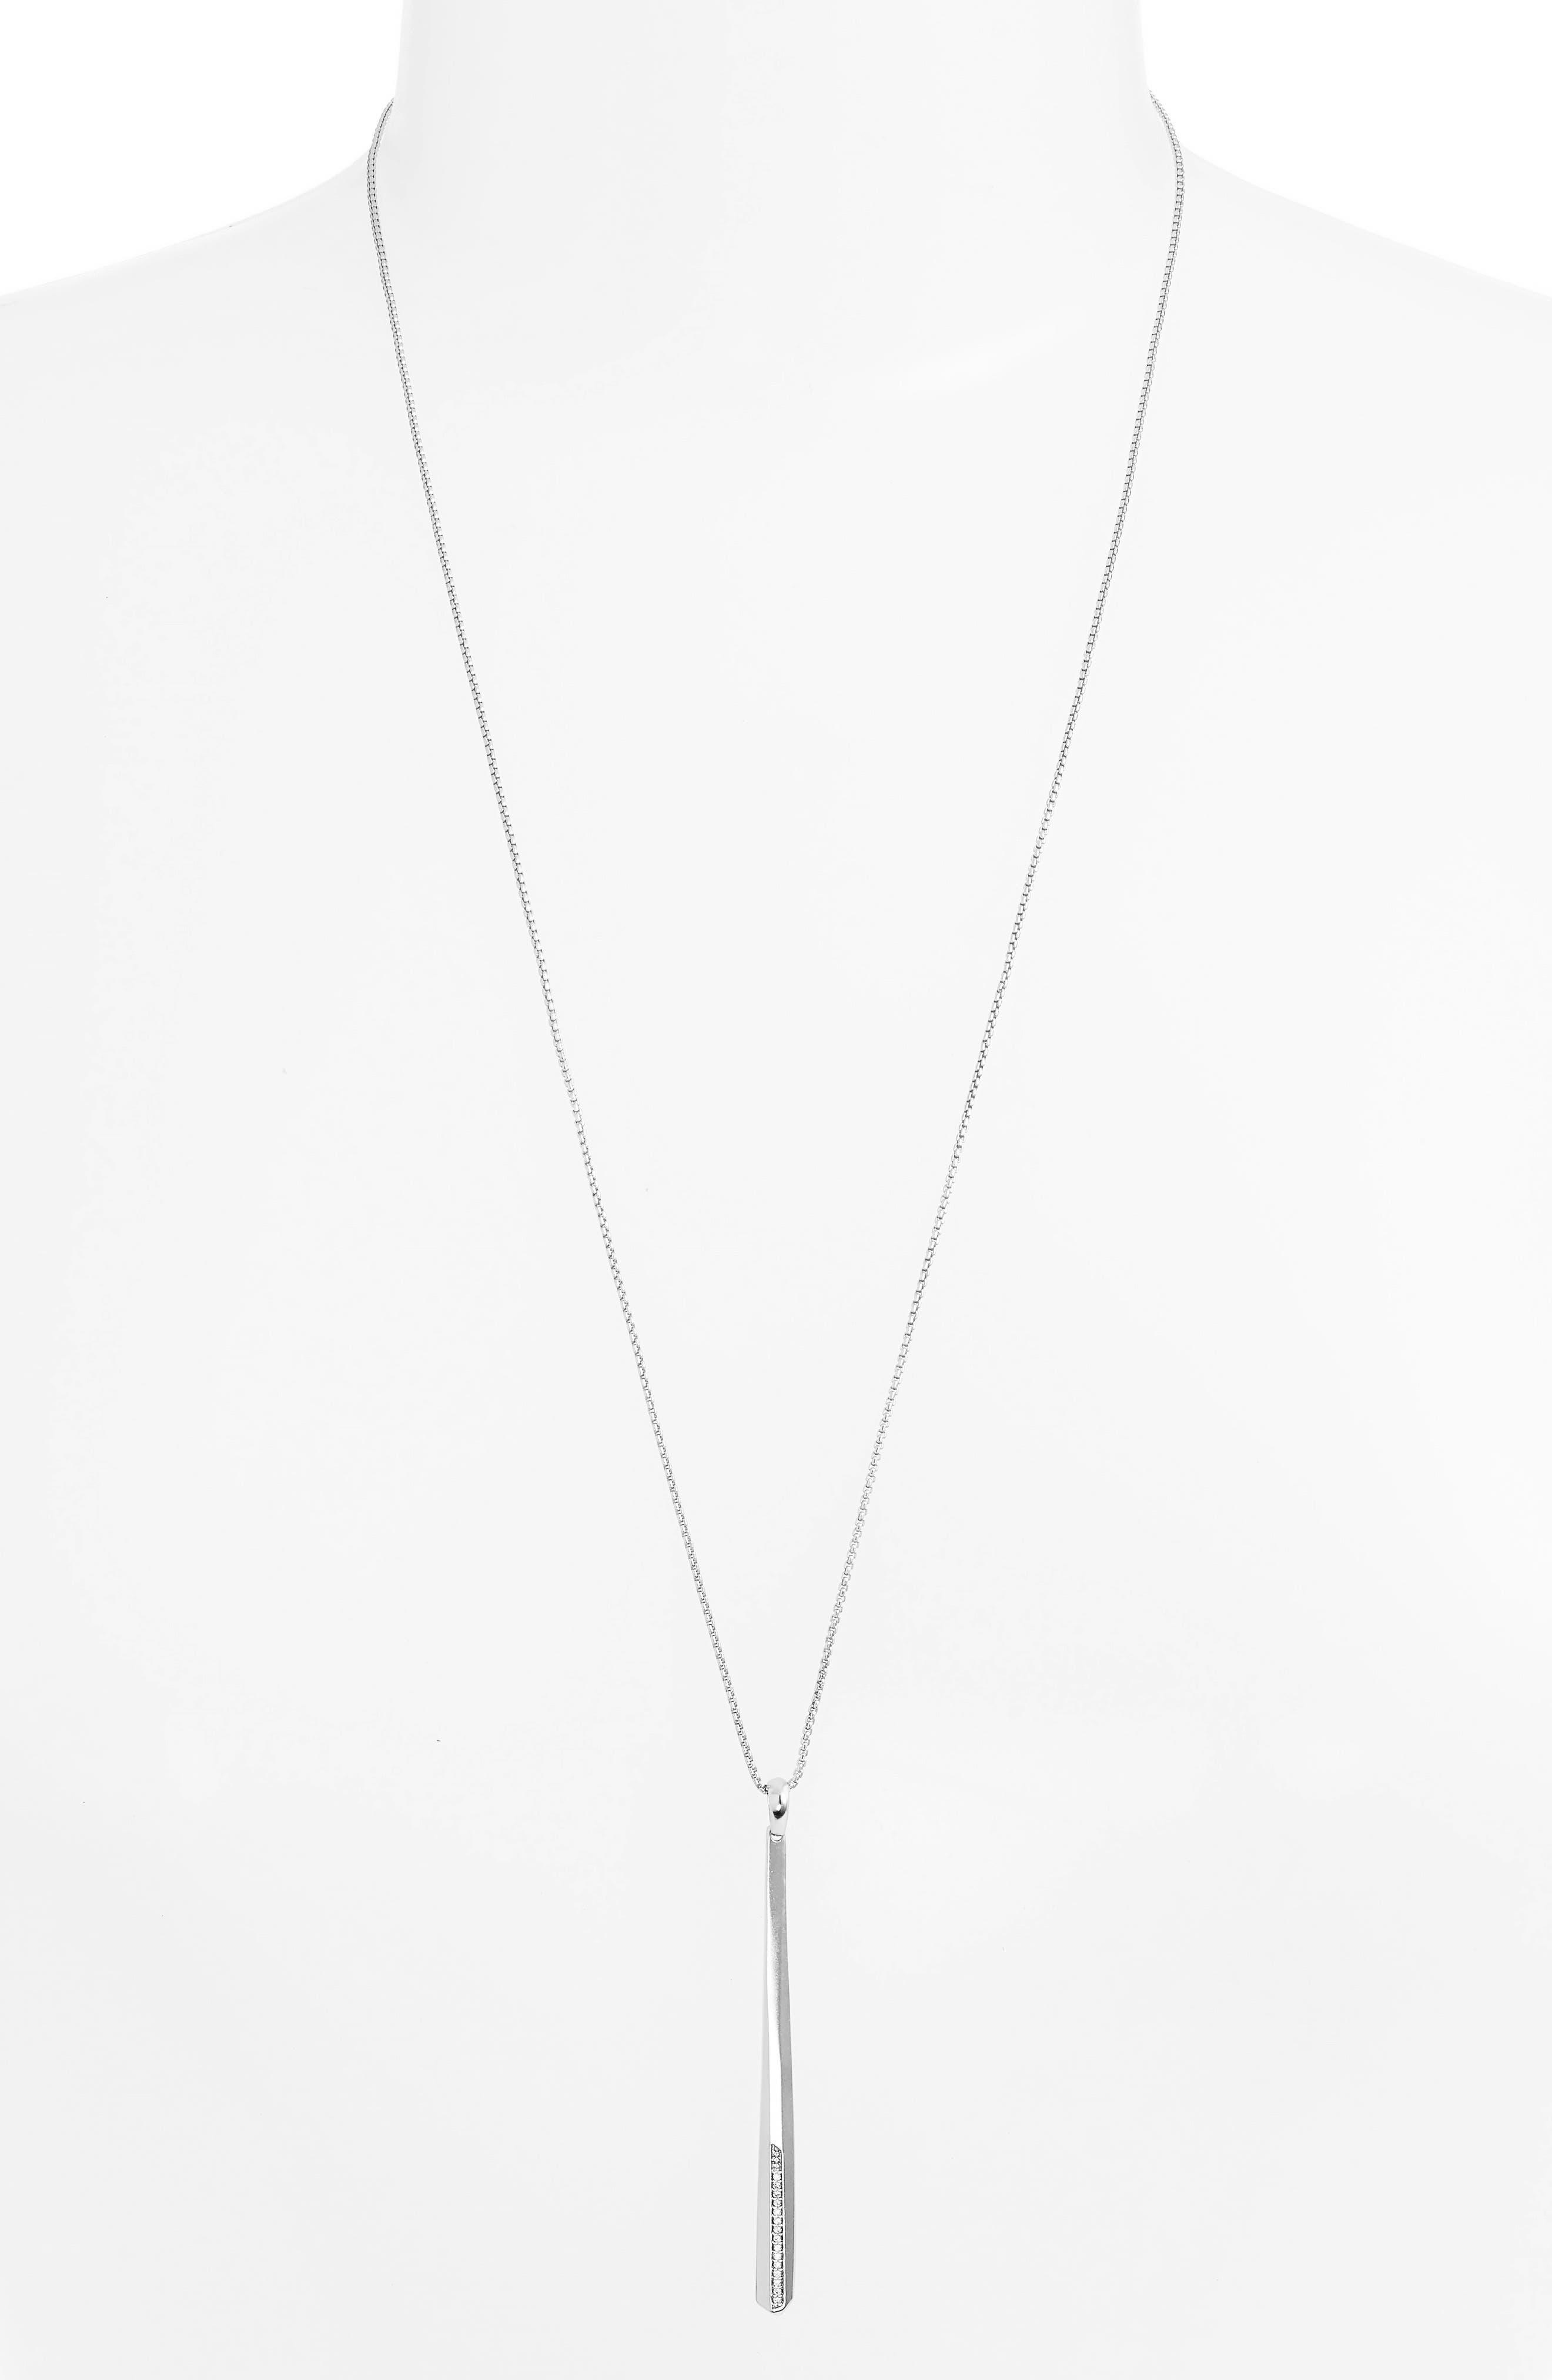 KENDRA SCOTT,                             Ro Adjustable Necklace,                             Alternate thumbnail 2, color,                             040